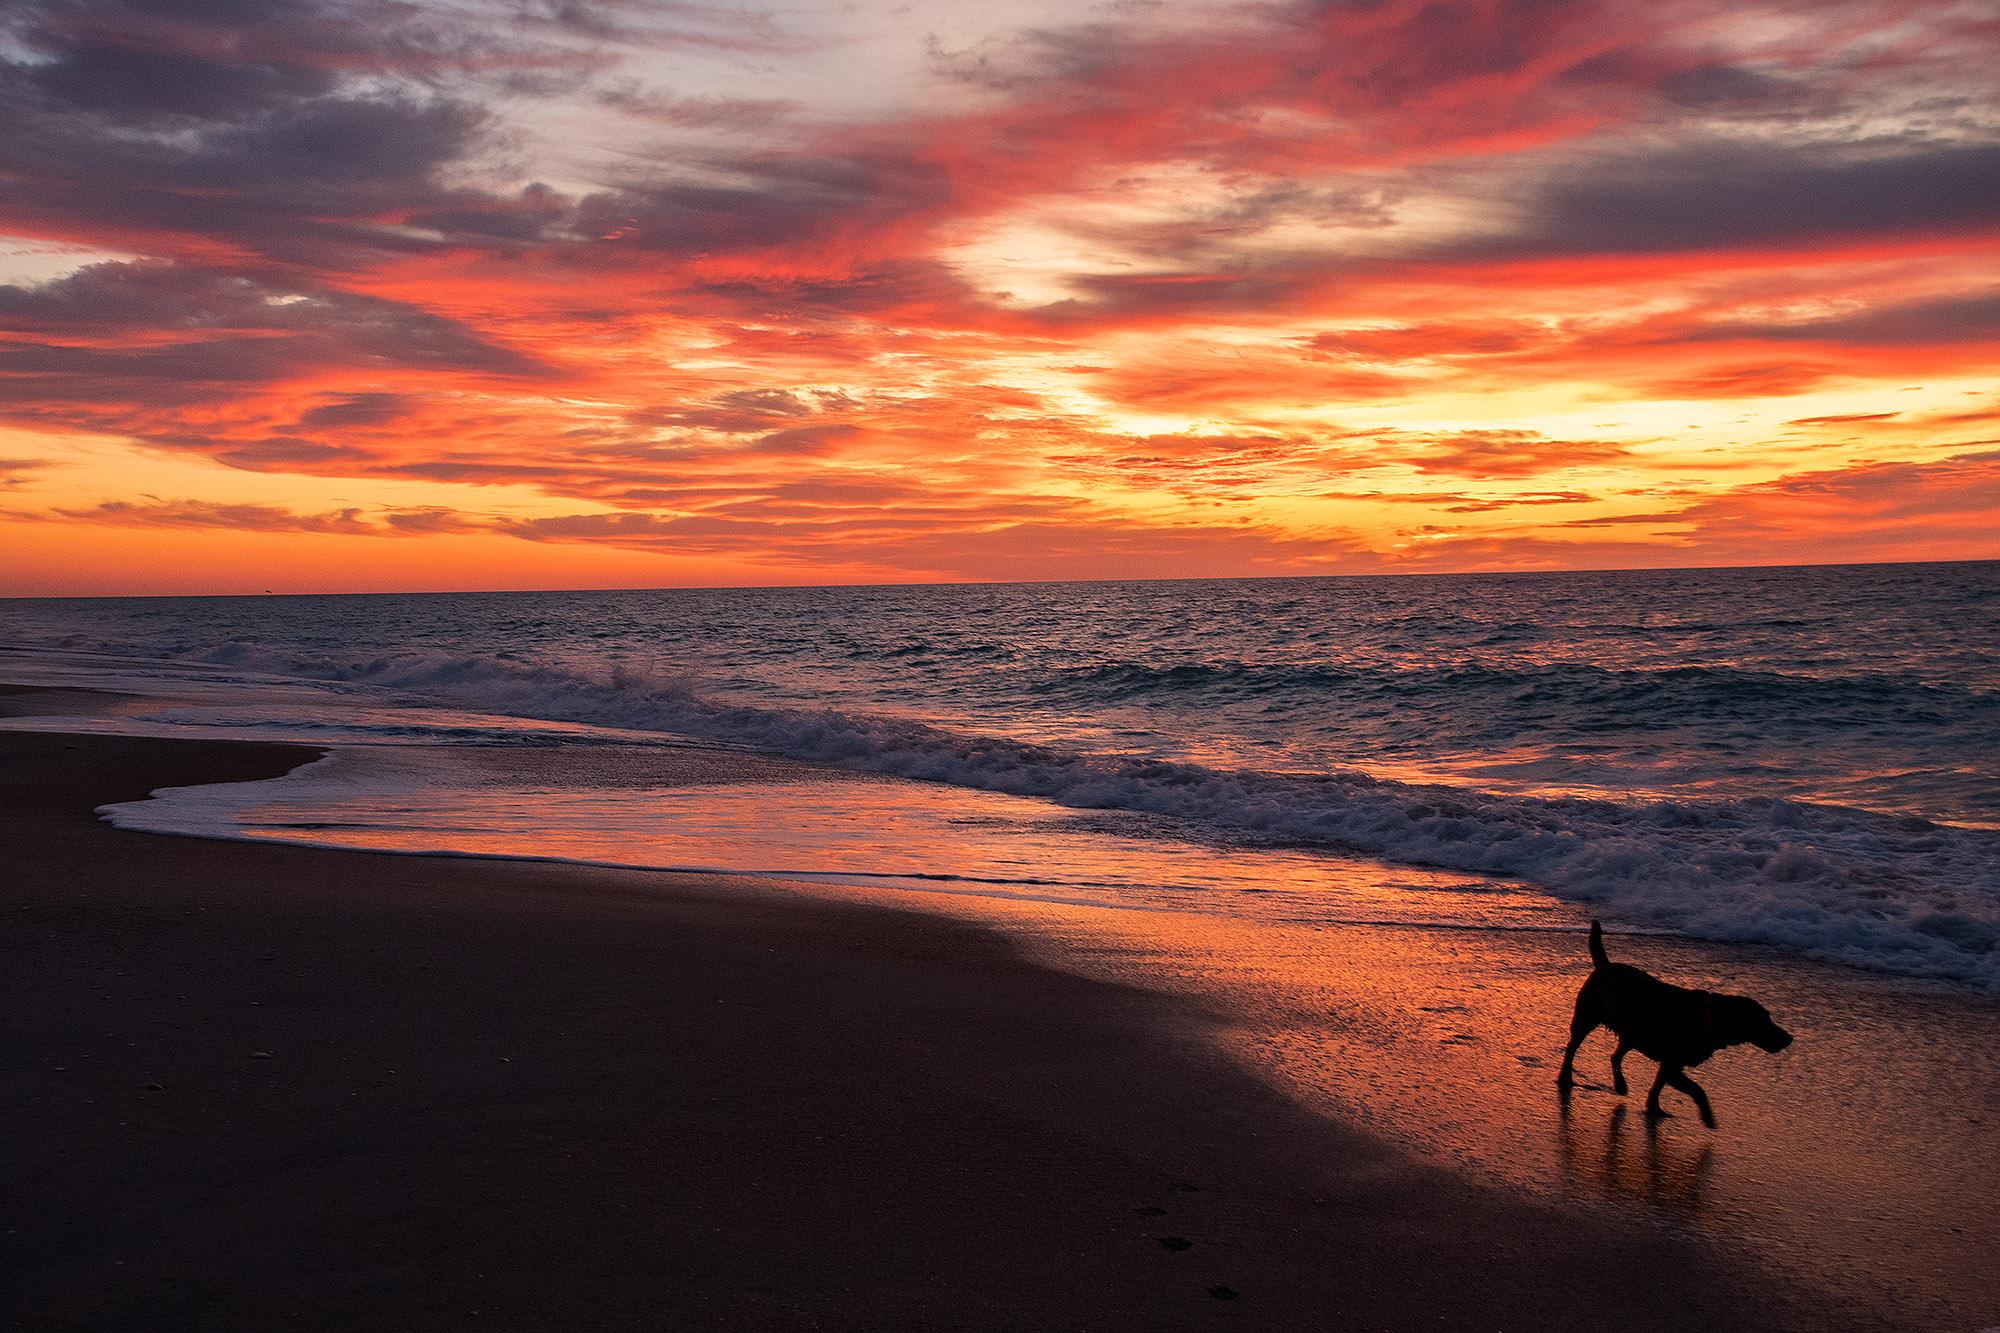 083119pod_sunrisedog4